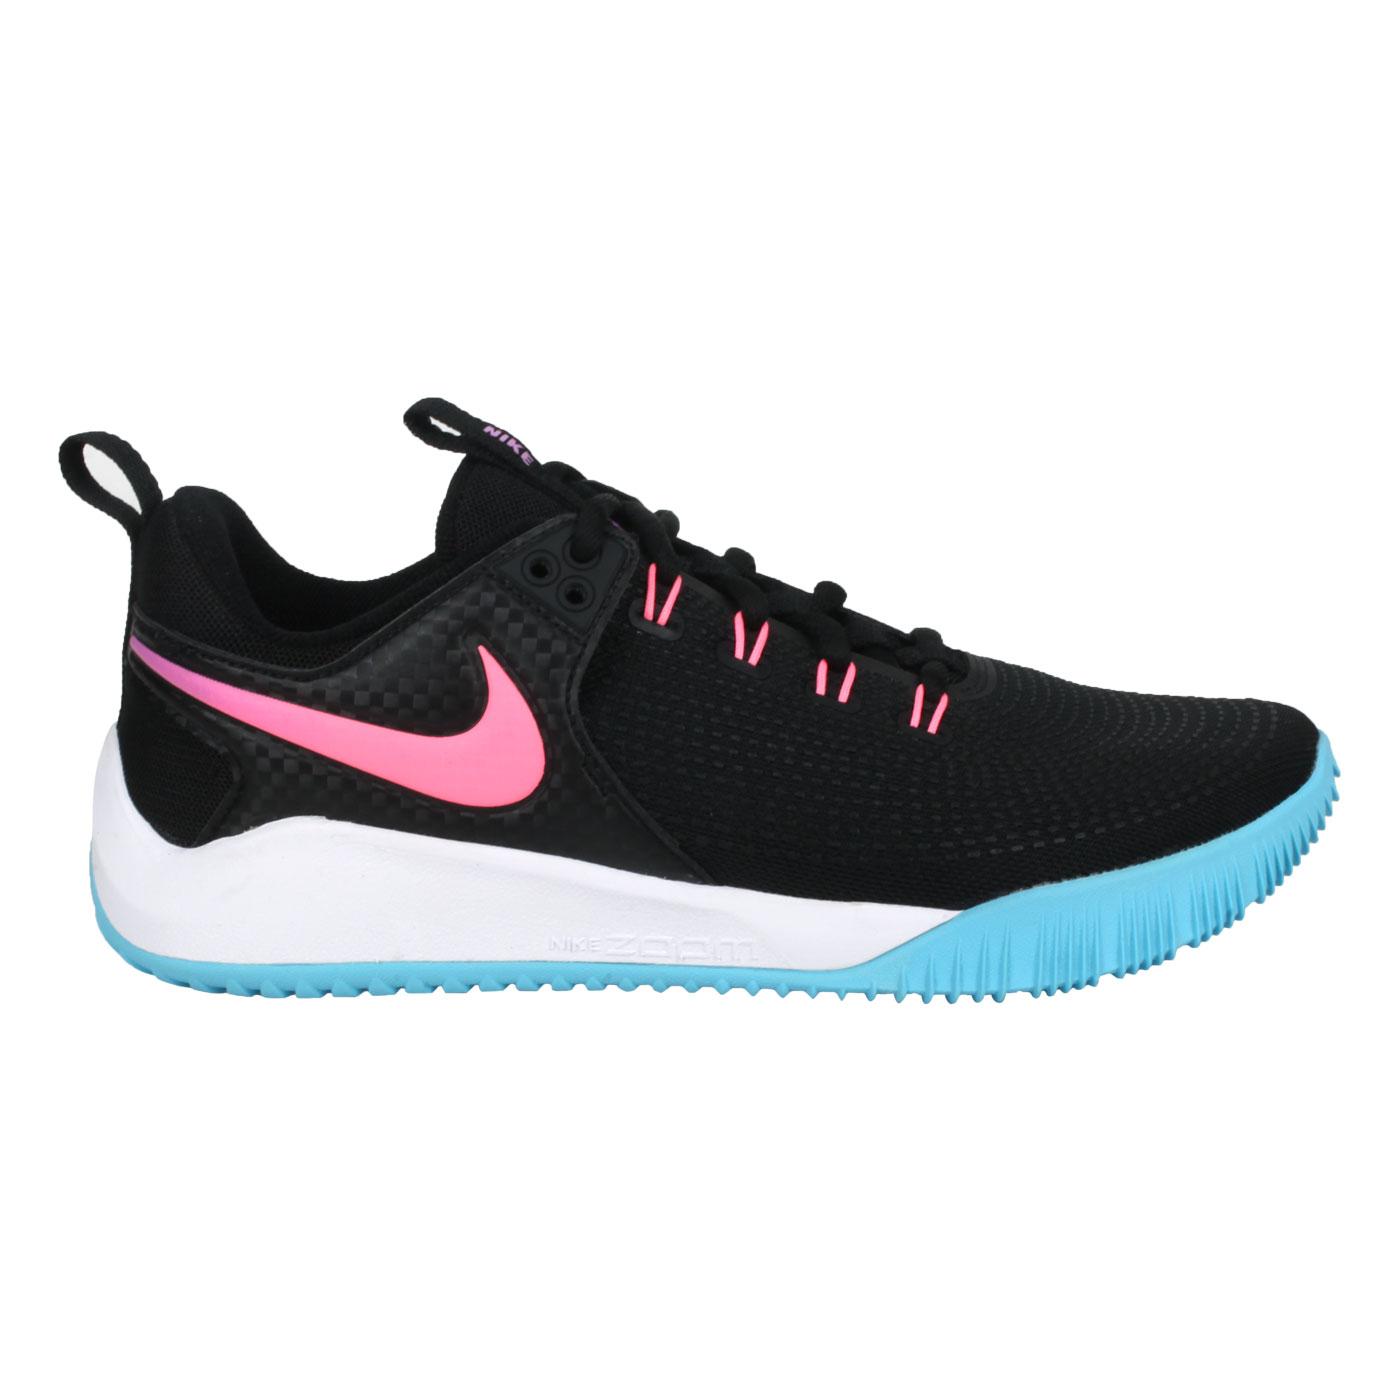 NIKE 男款排球鞋  @AIR ZOOM HYPERACE 2 SE@DM8199064 - 黑藍粉